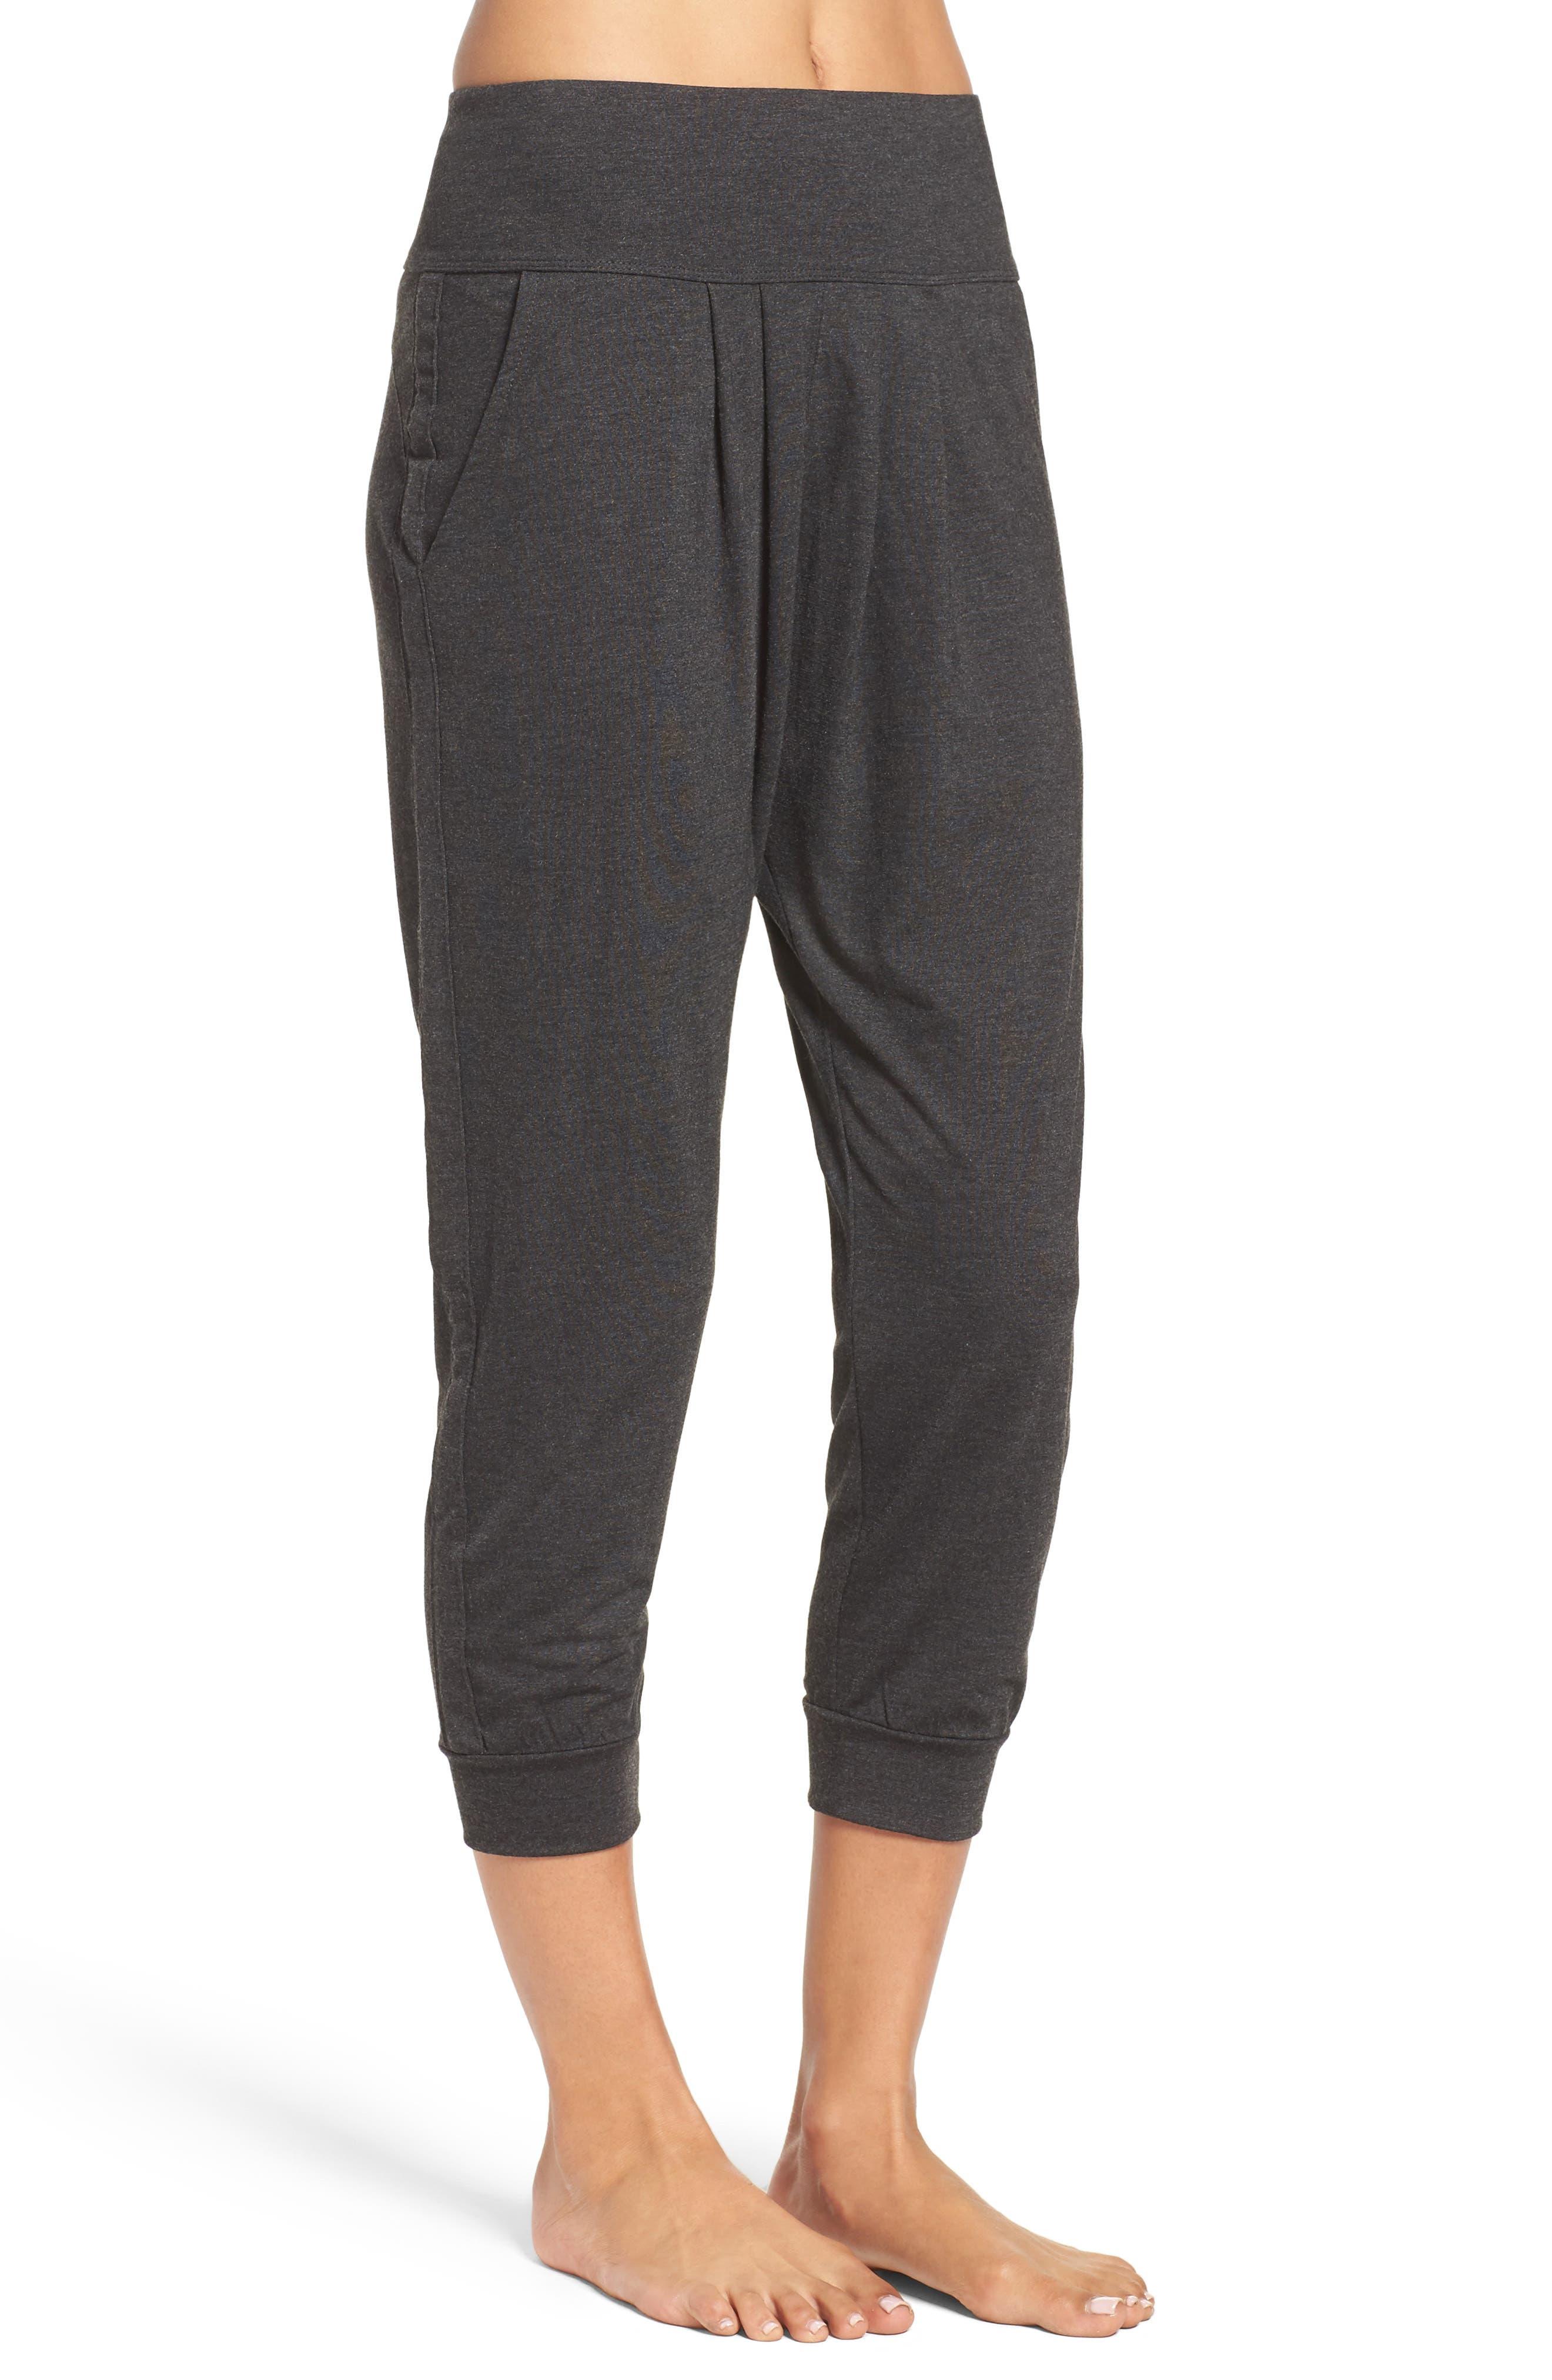 Harmony Crop Harem Pants,                             Alternate thumbnail 3, color,                             Grey Dark Charcoal Heather